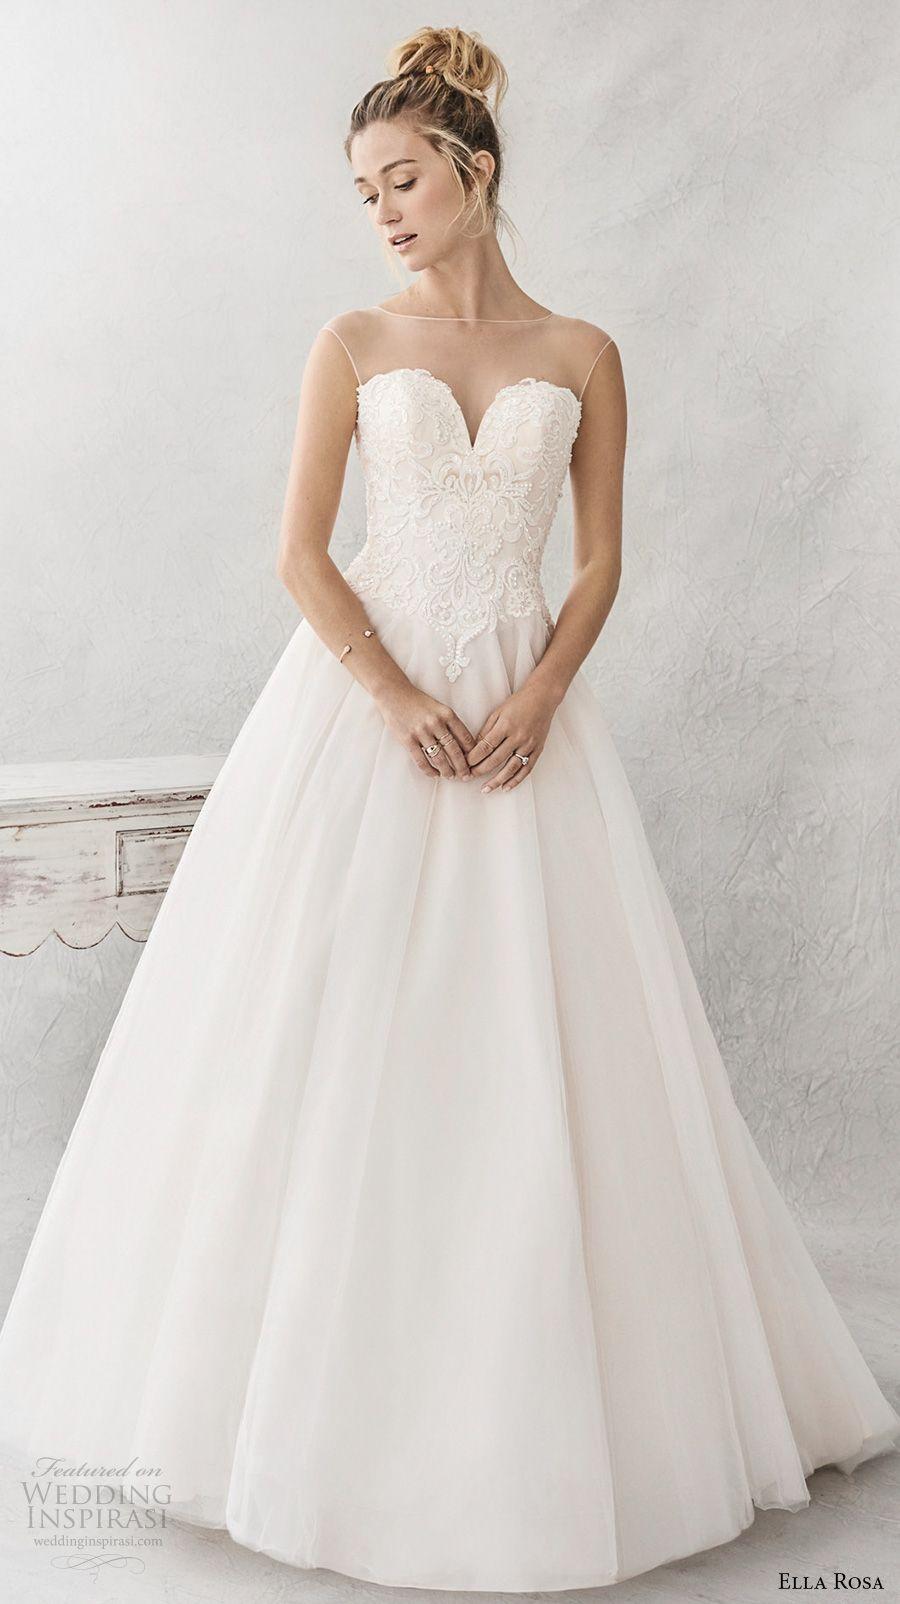 Ella rosa spring wedding dresses chapel train wedding dress